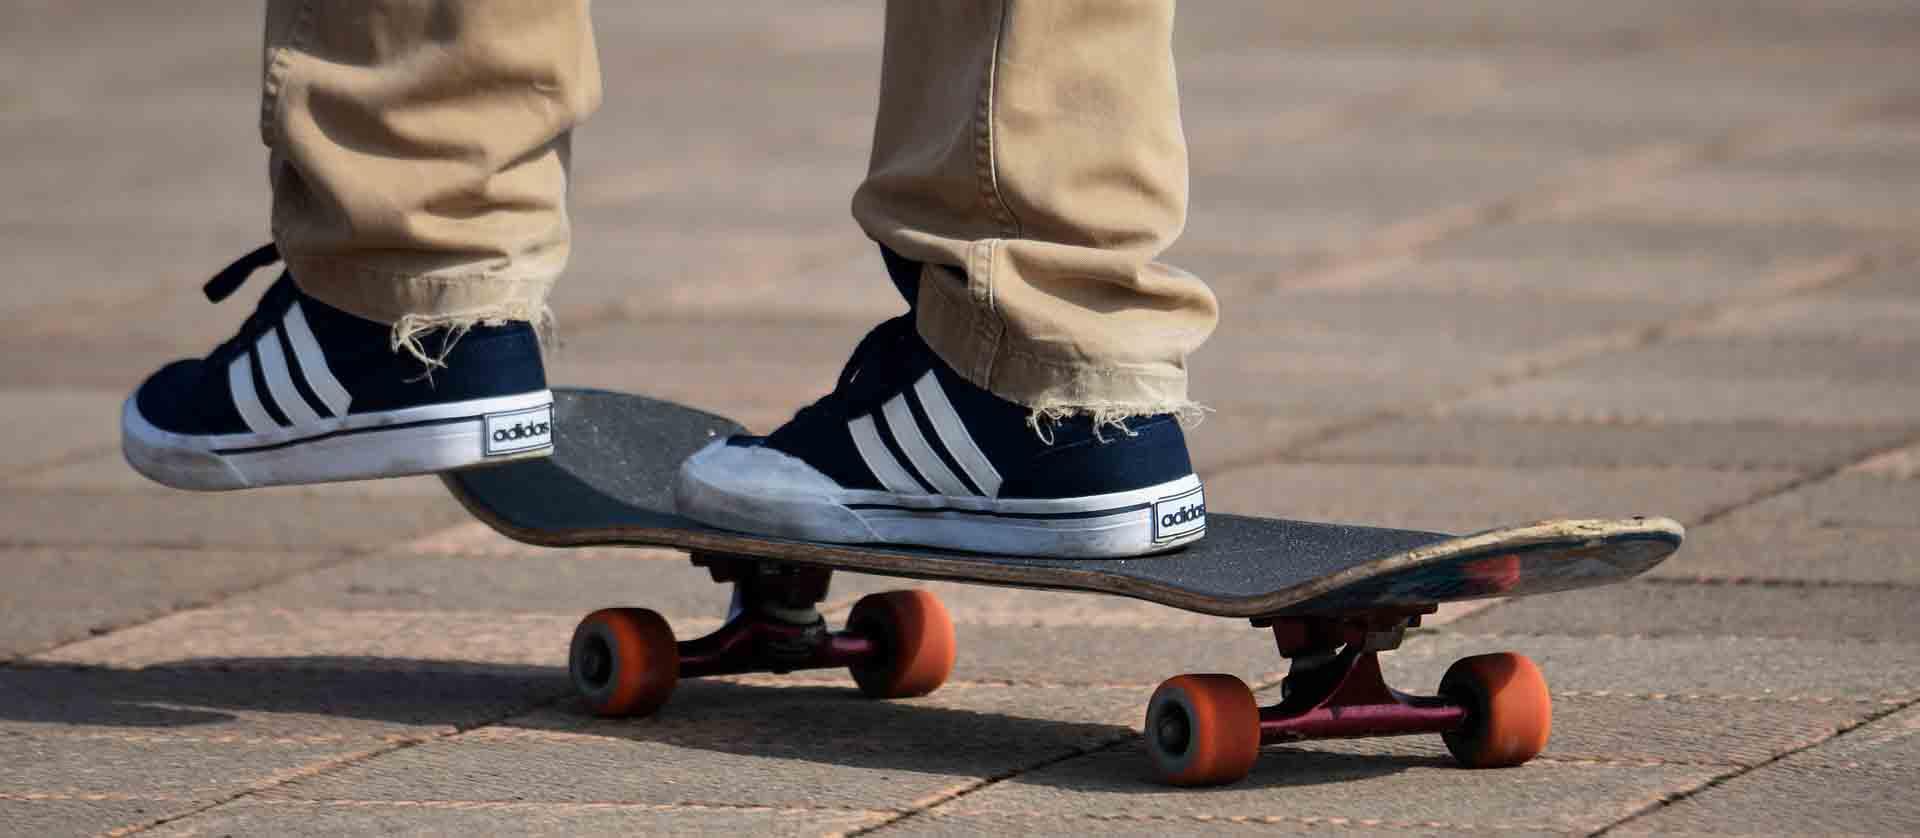 skateboarding sports